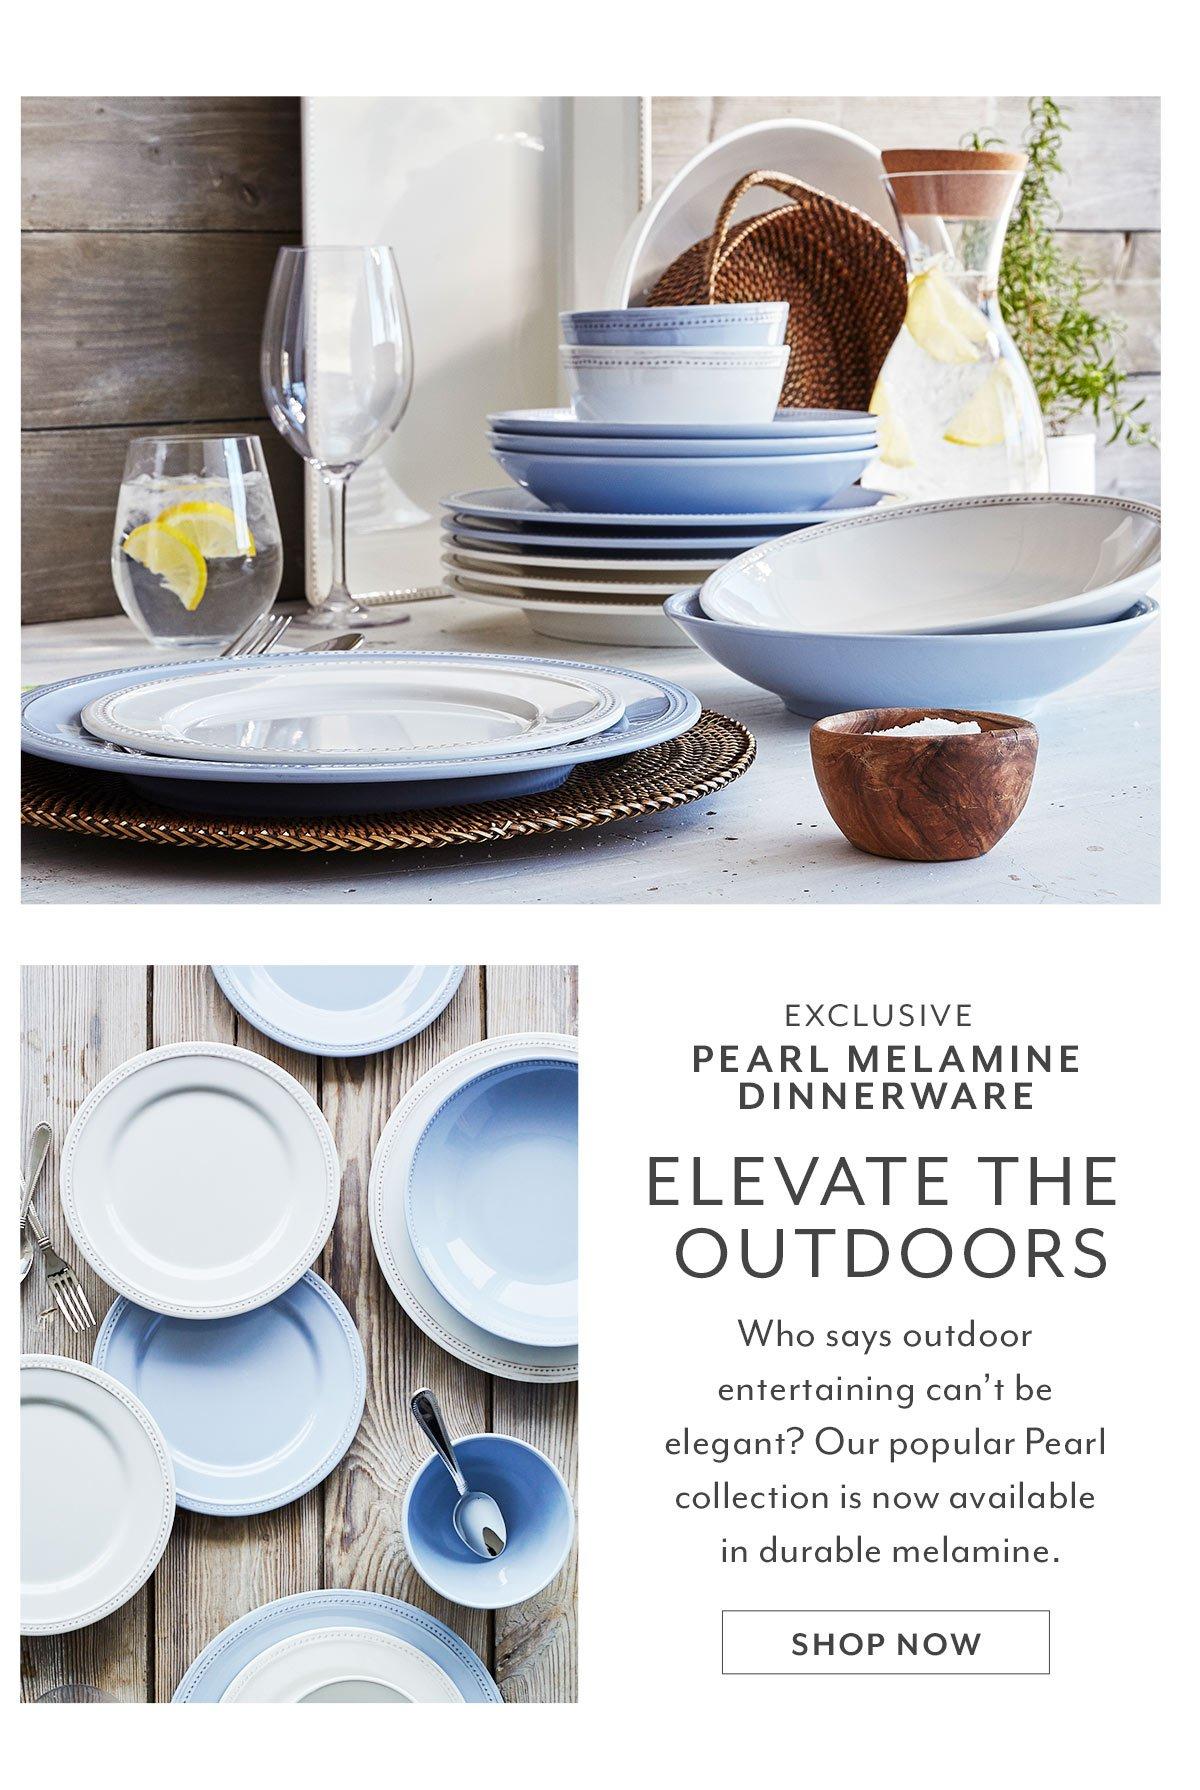 Pearl Melamine Dinnerware